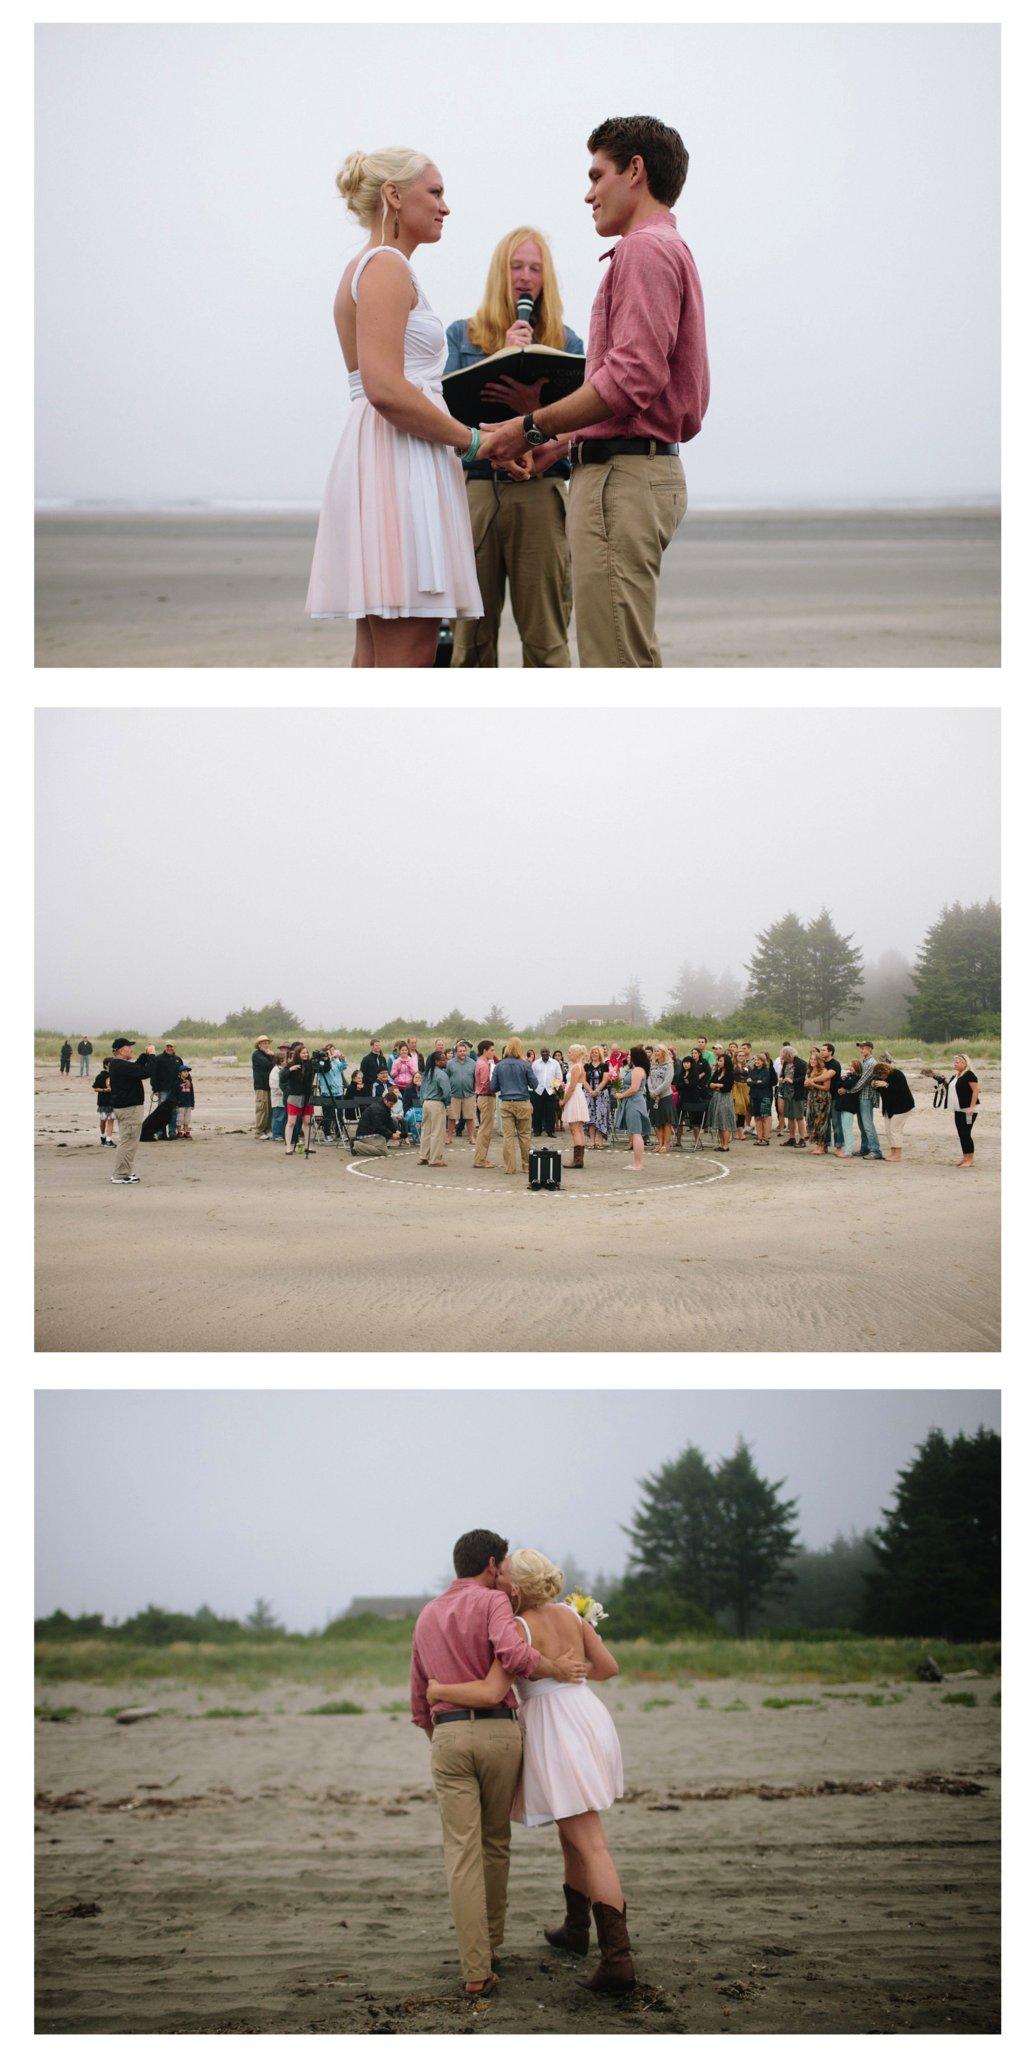 Coffey-wood-beach-real-wedding-linhbergh-photography-bride-groom-ceremony.full